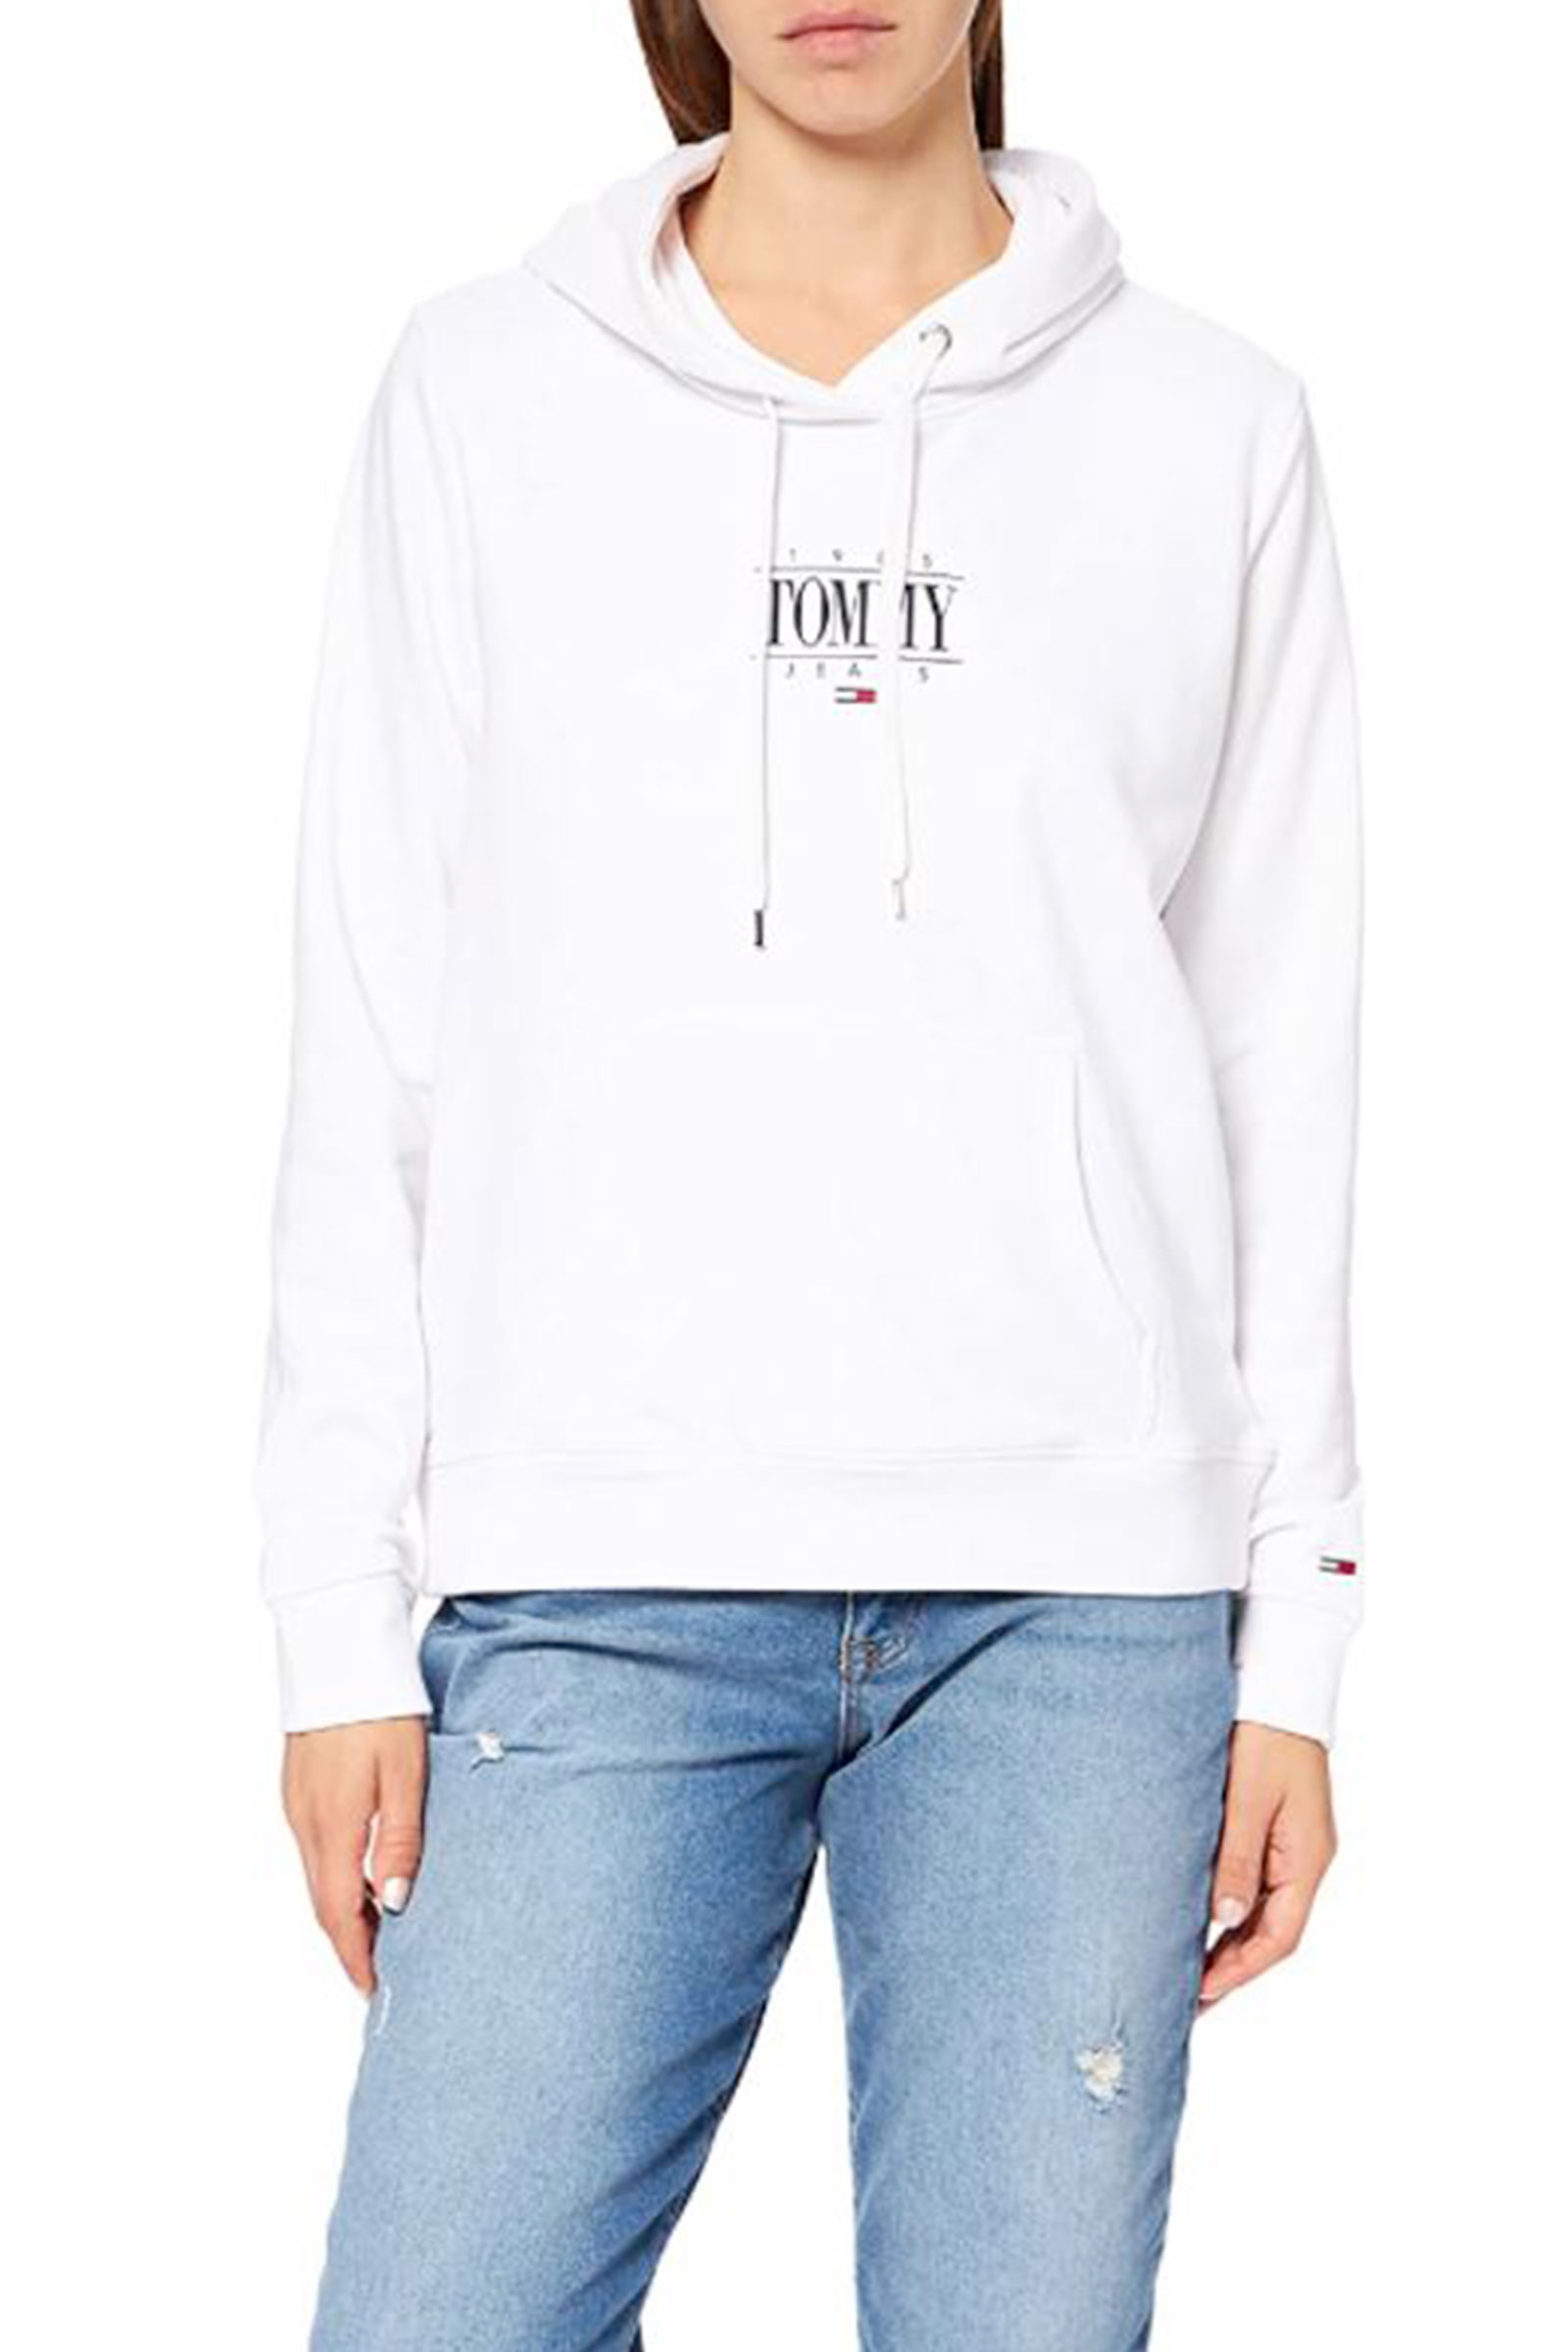 TOMMY JEANS | Sweatshirt | DW0DW11049YBR